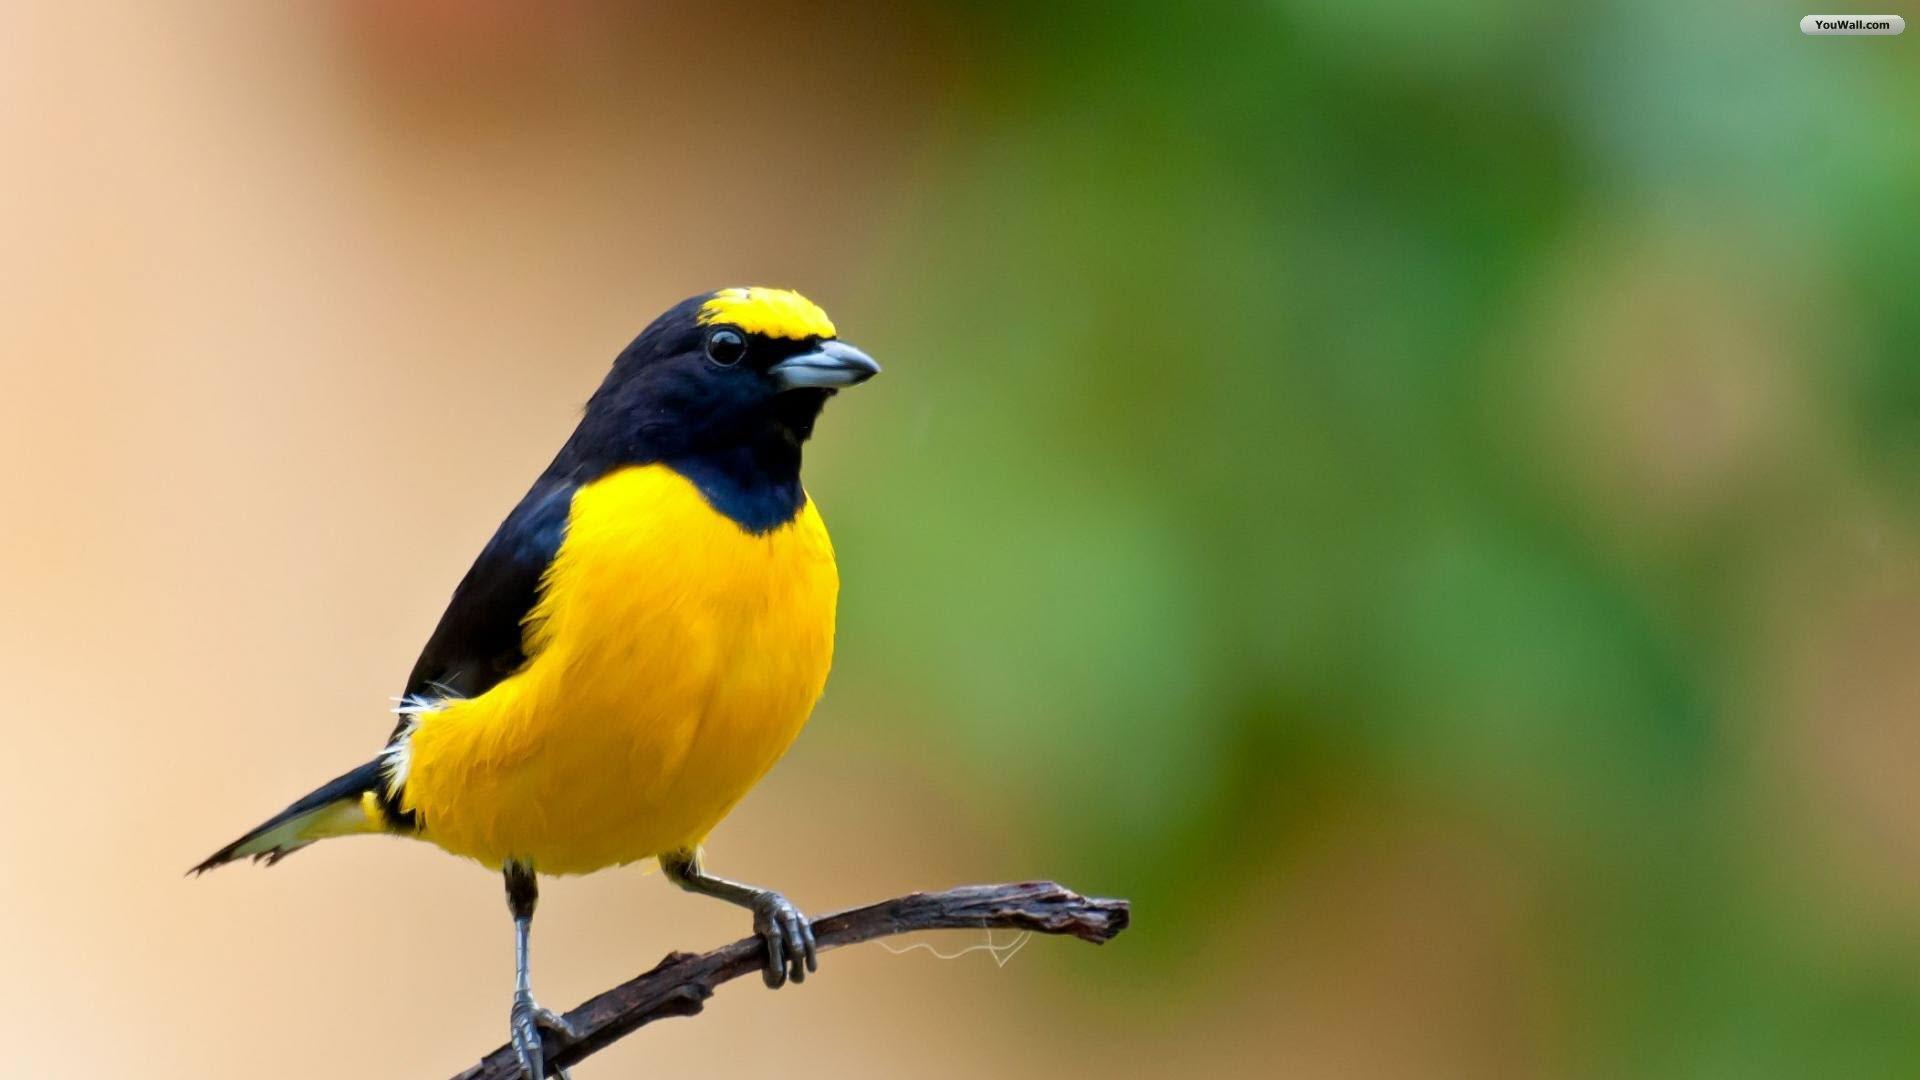 Birds 980199 Birds 980205 Birds 980219 Birds 980203 Birds 980209 1920x1080